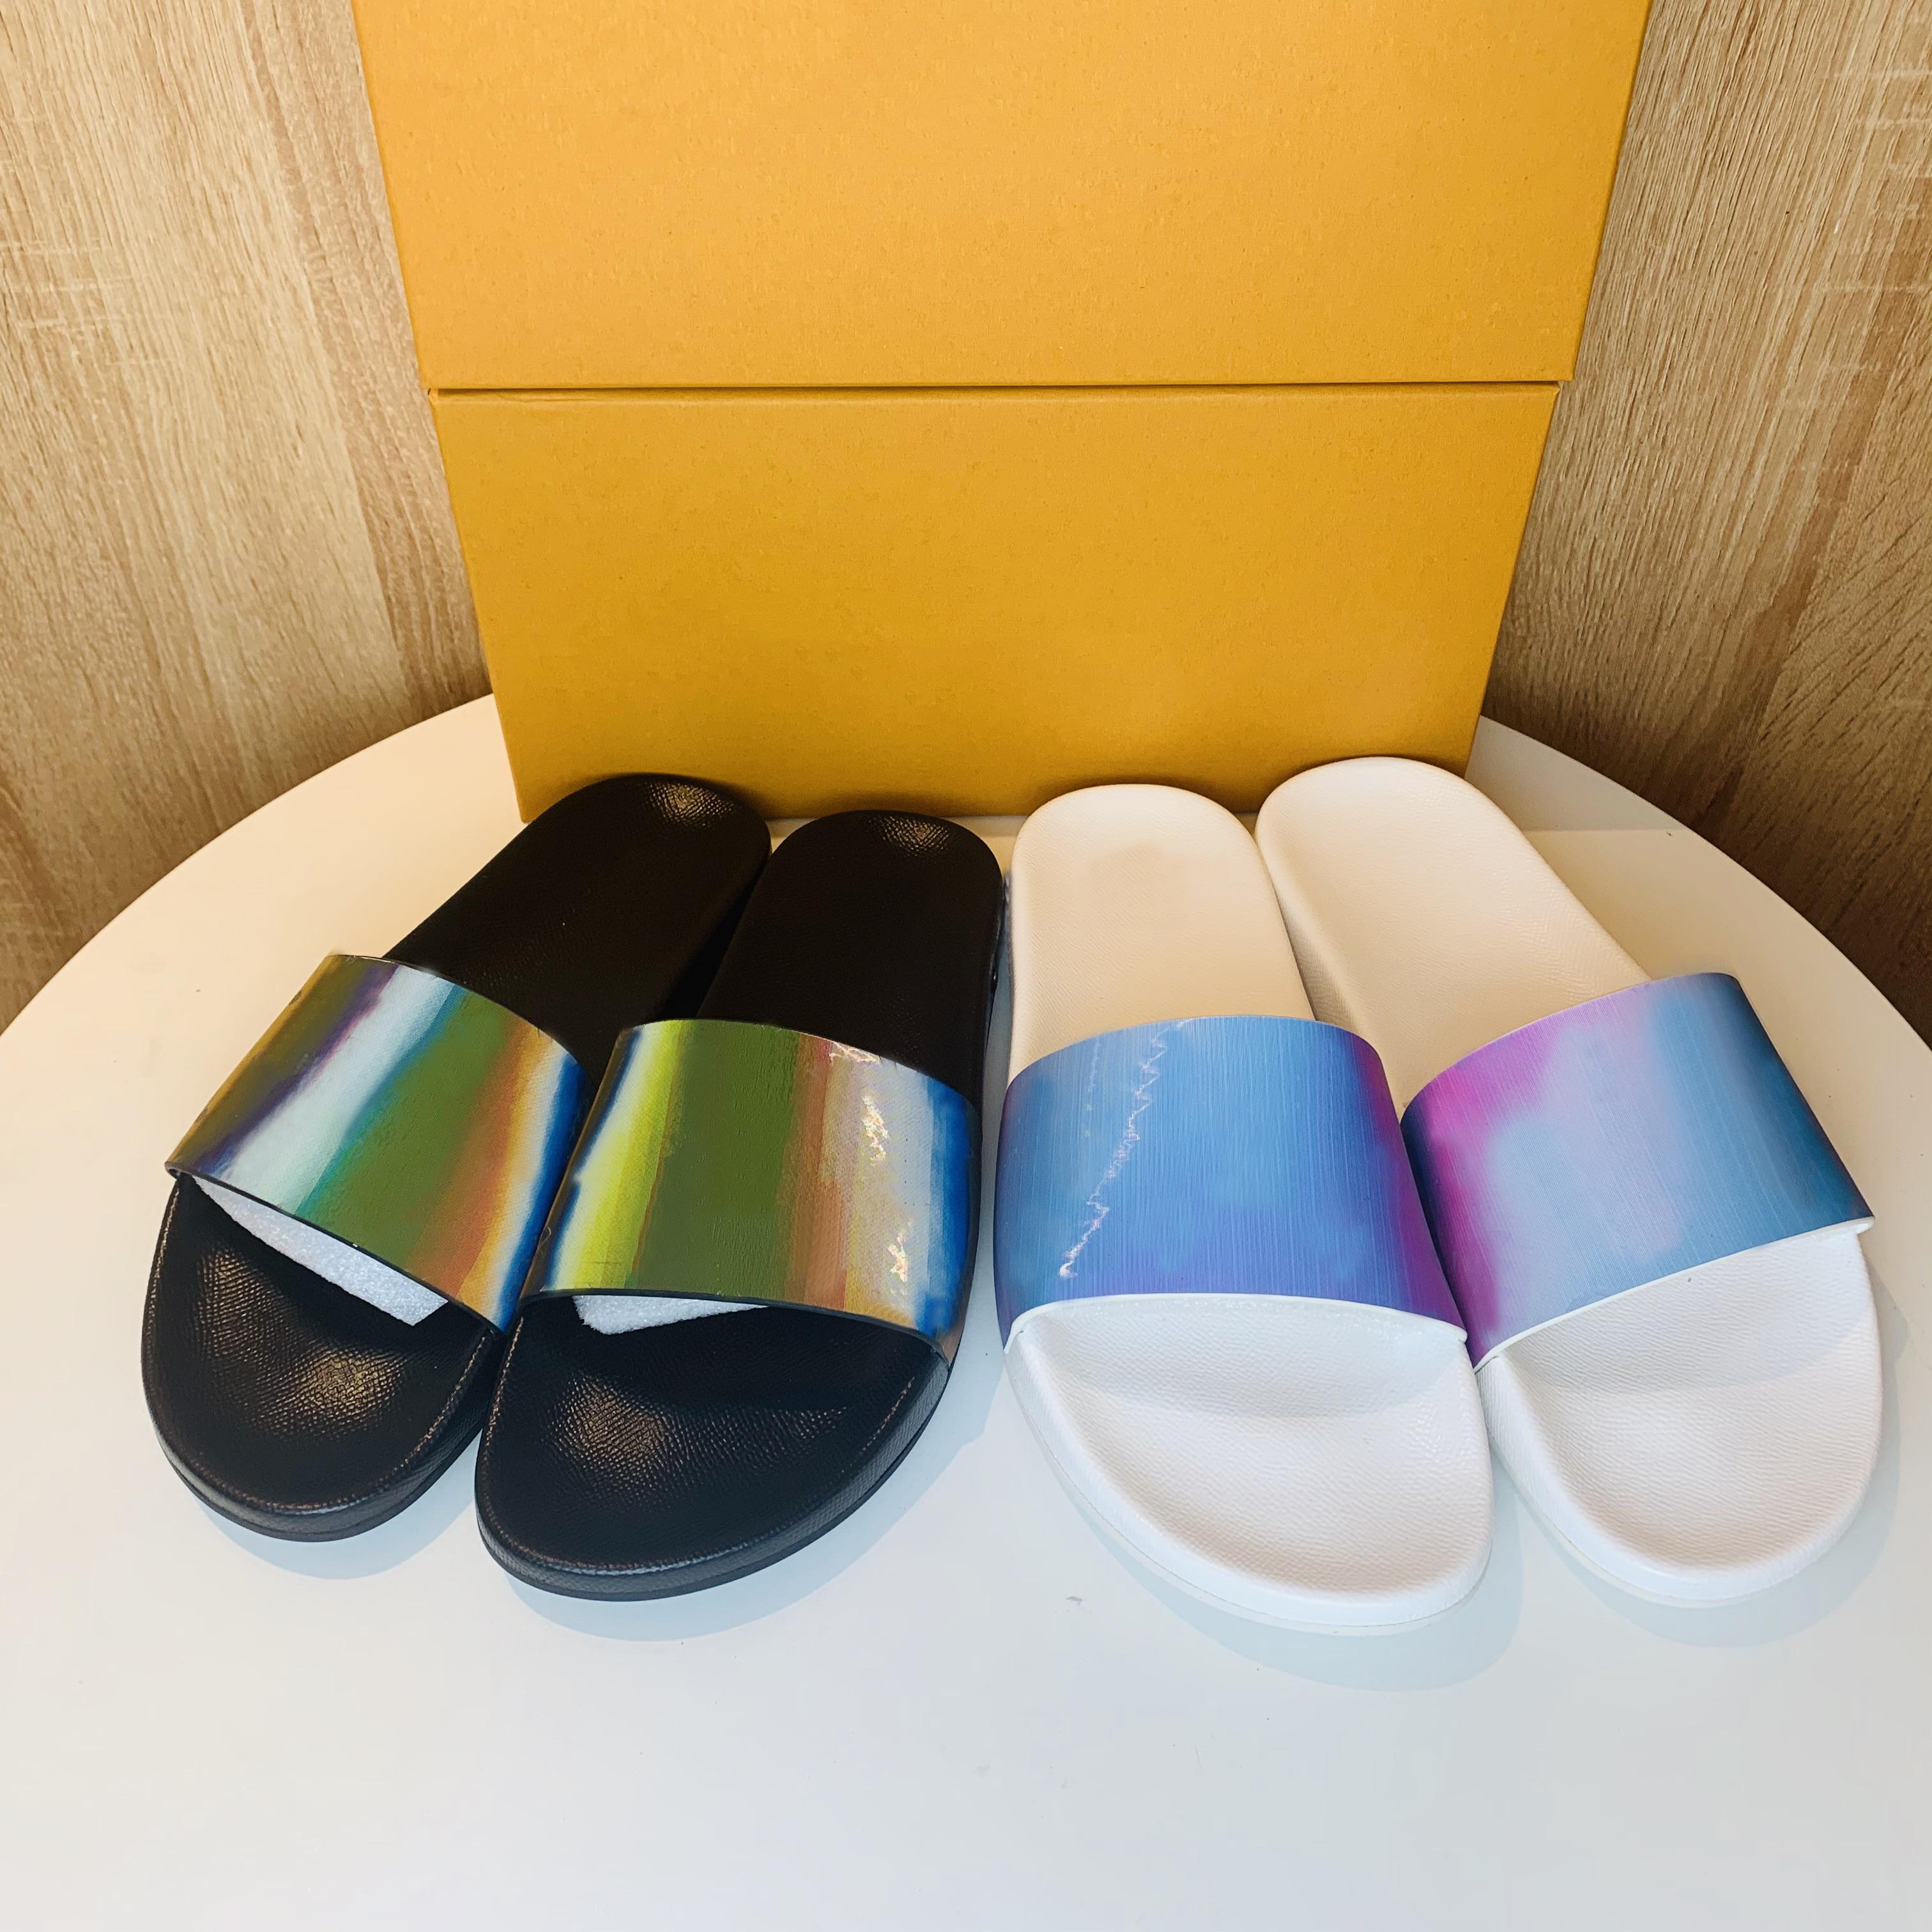 Designer Flip Flops Mens Womens Summer Sandals Sandals Beach Slide Pantofole da donna Sandali Firmati da donna scarpe classiche laser colorato